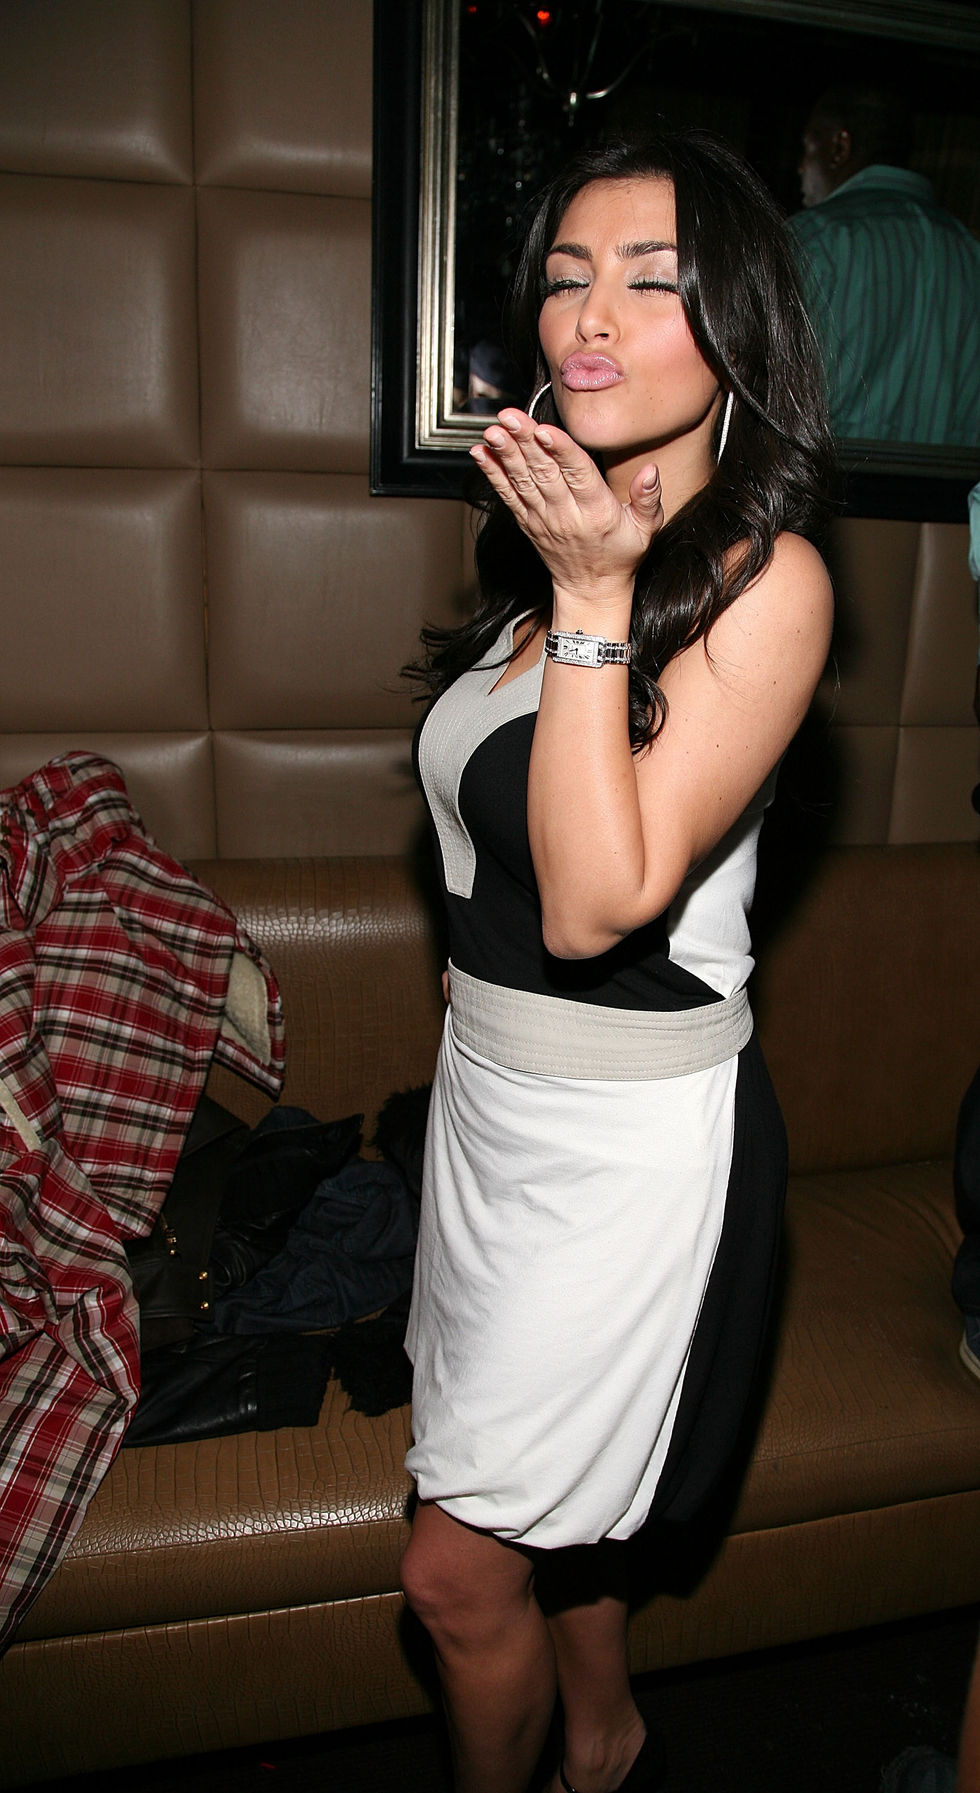 kim-kardashian-hosts-a-celebration-at-room-service-in-new-york-city-01